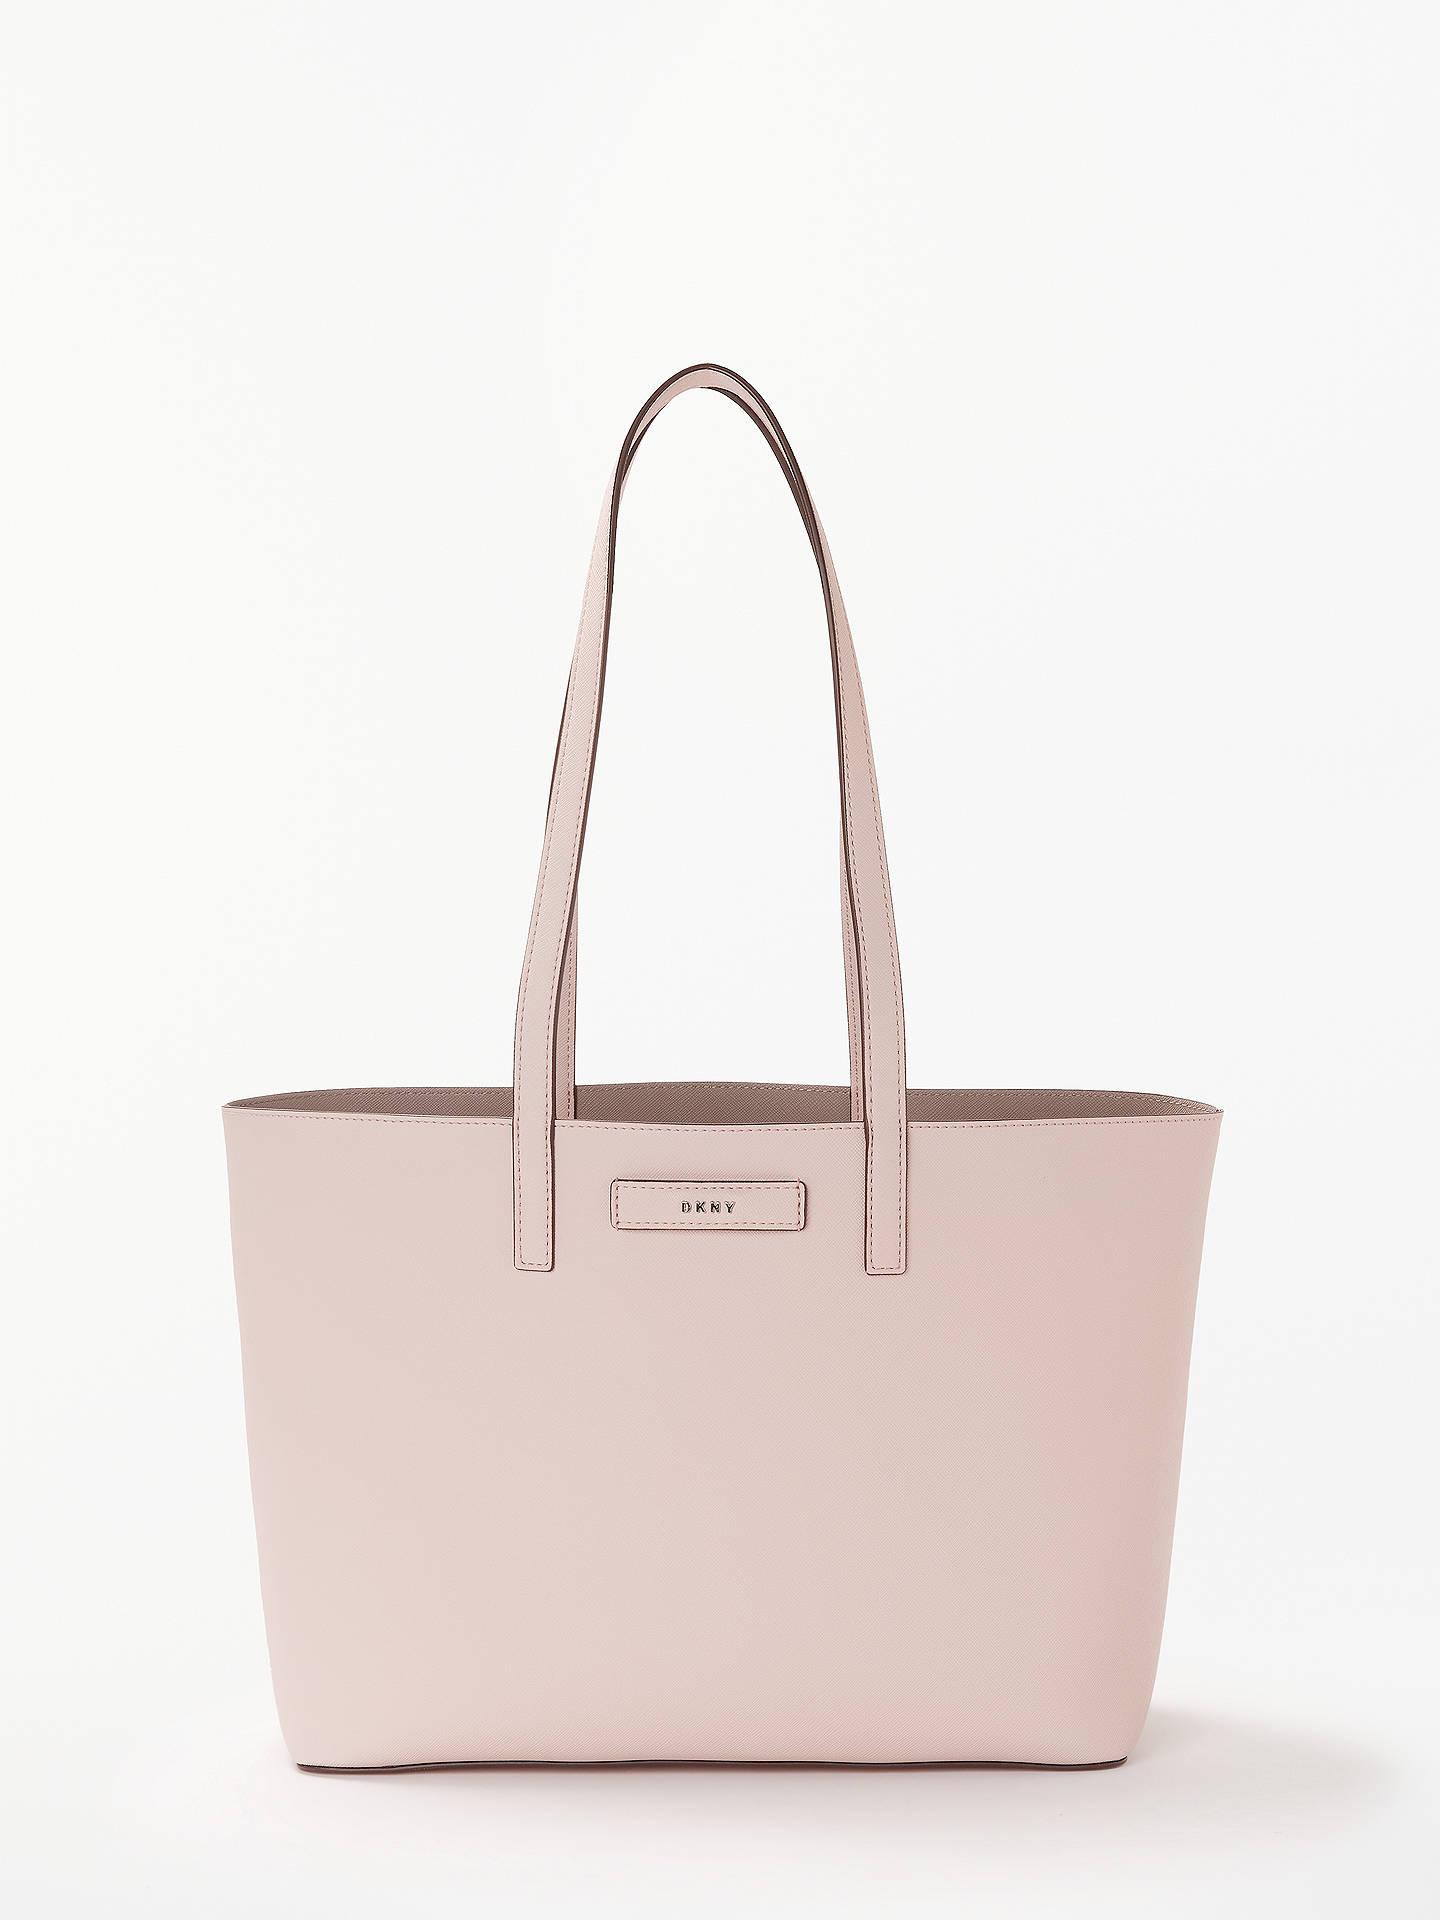 97ab1764a4094 Buy DKNY Brayden Medium Reversible Tote Bag, Iconic Blush/Multi Online at  johnlewis.